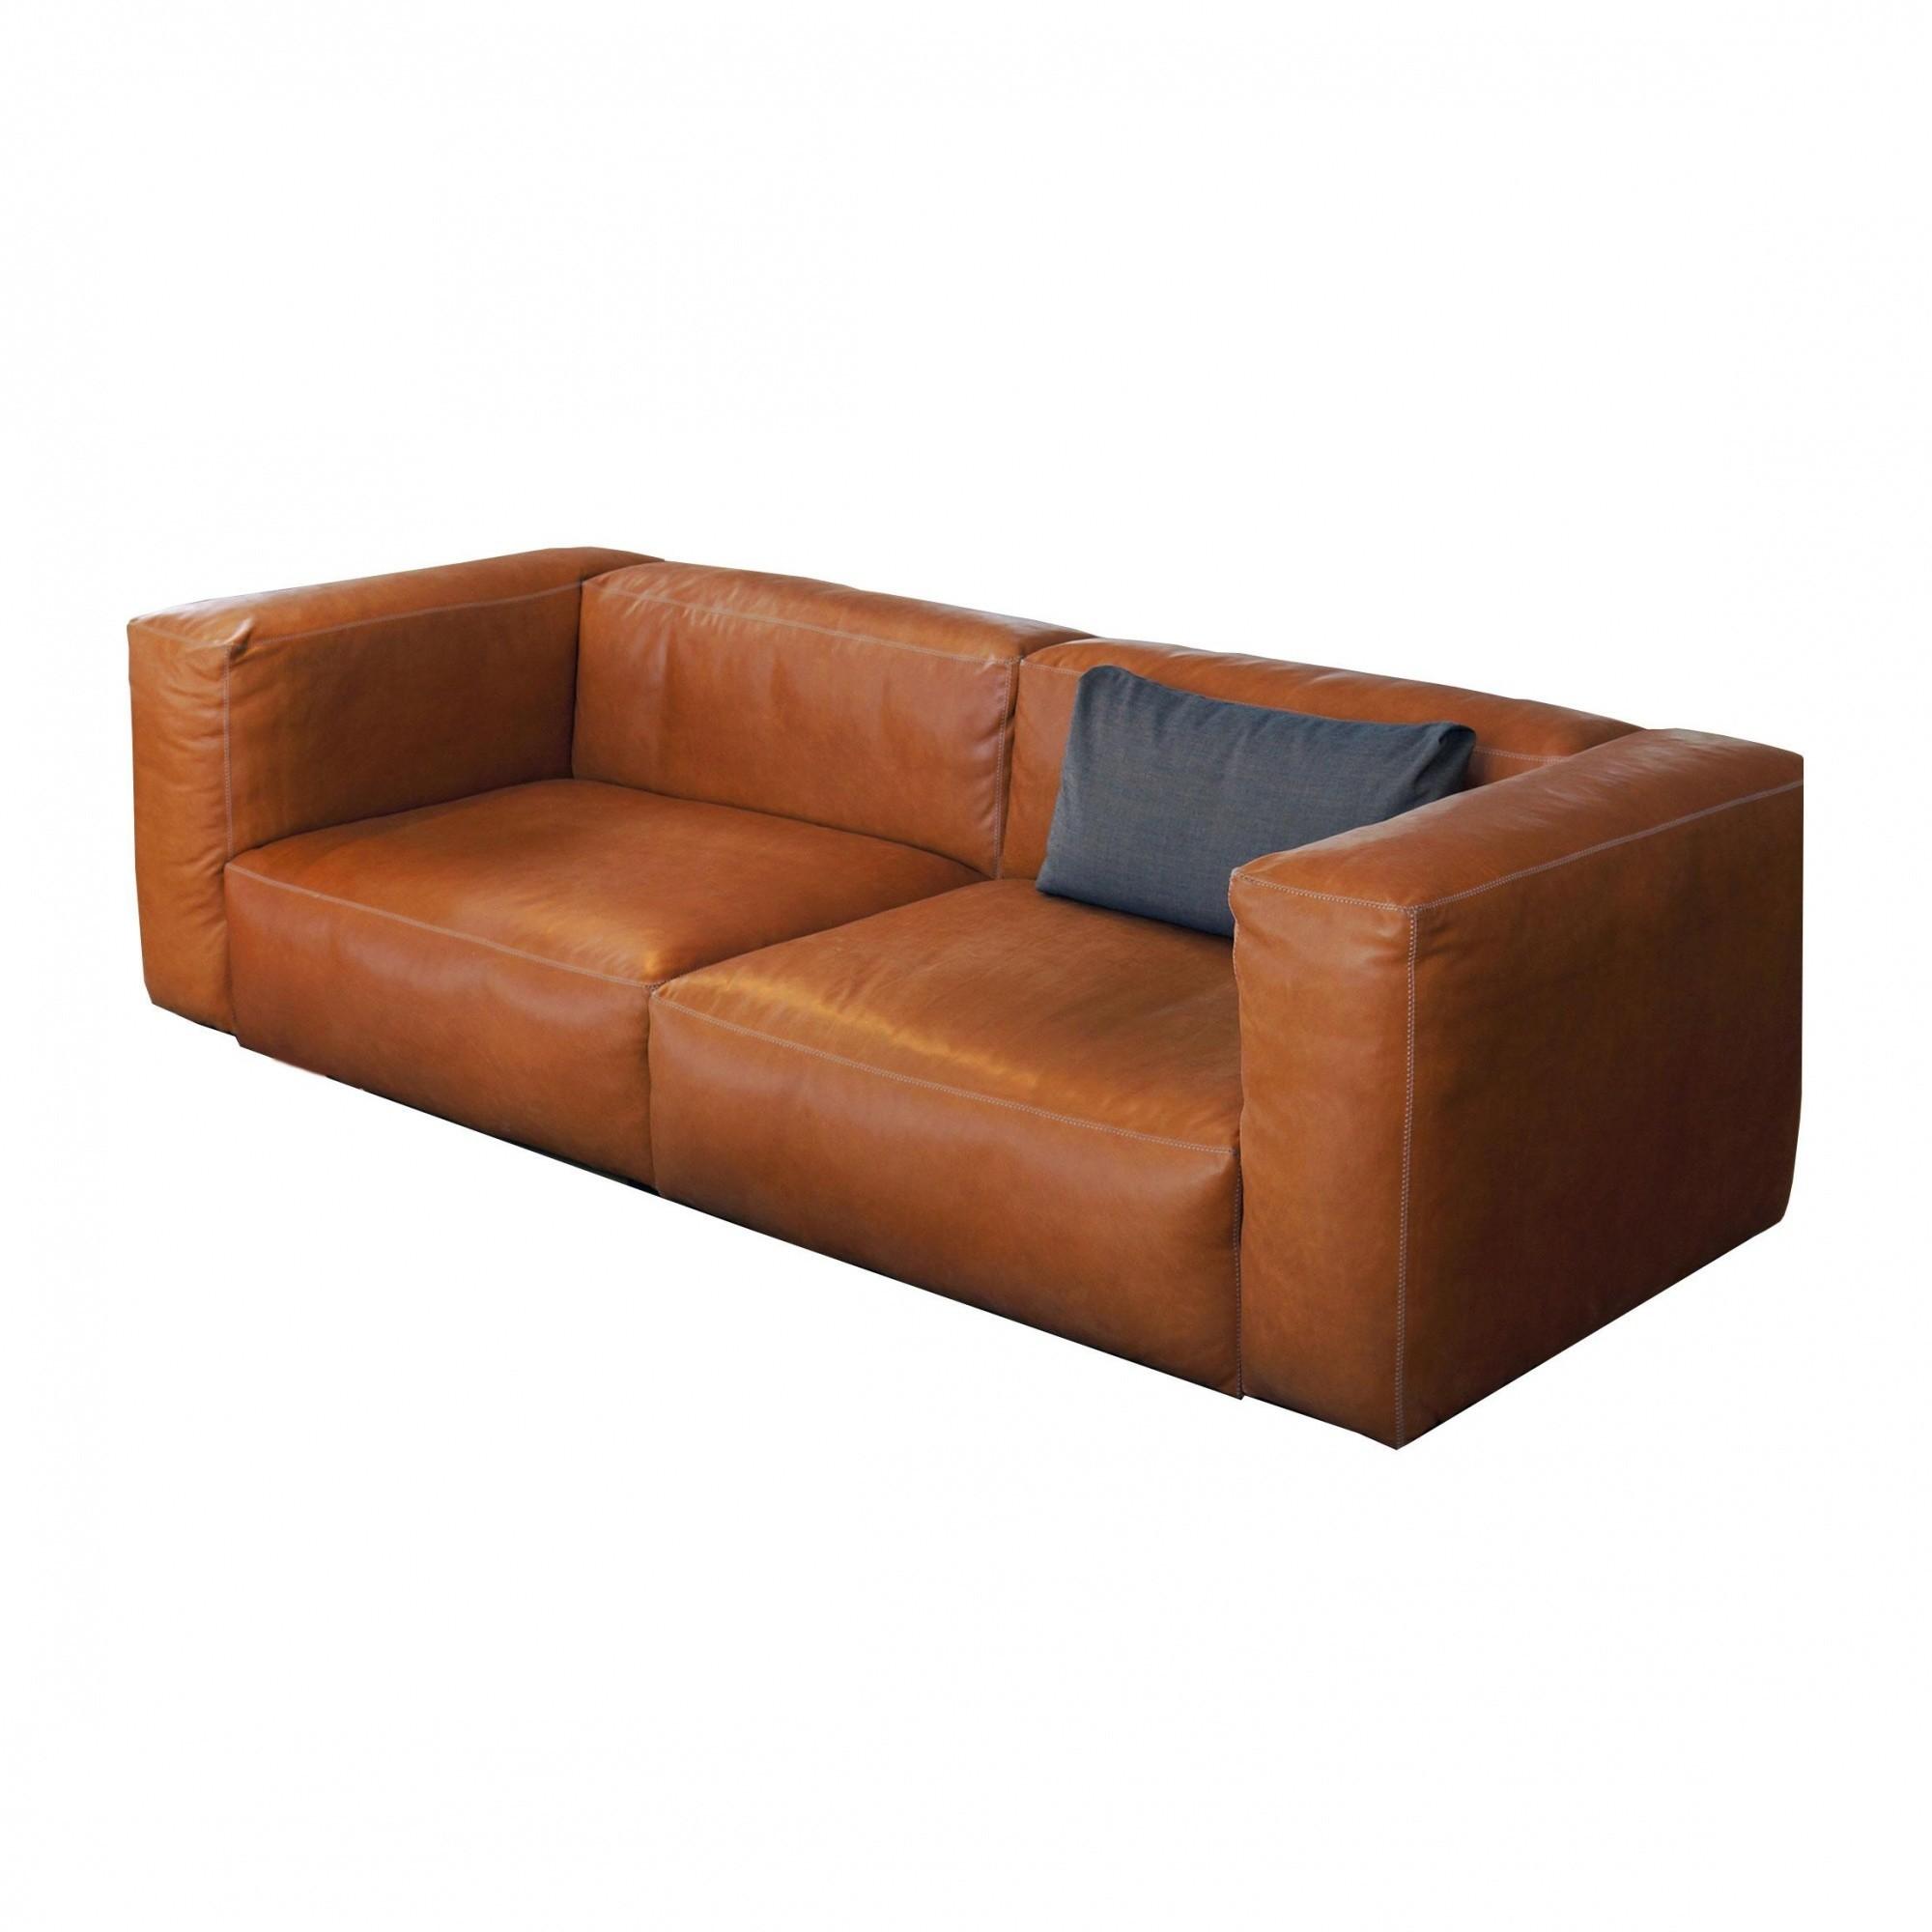 HAY   Mags Soft Leather Sofa 228x95.5cm   Cognac/sofa Legs ...